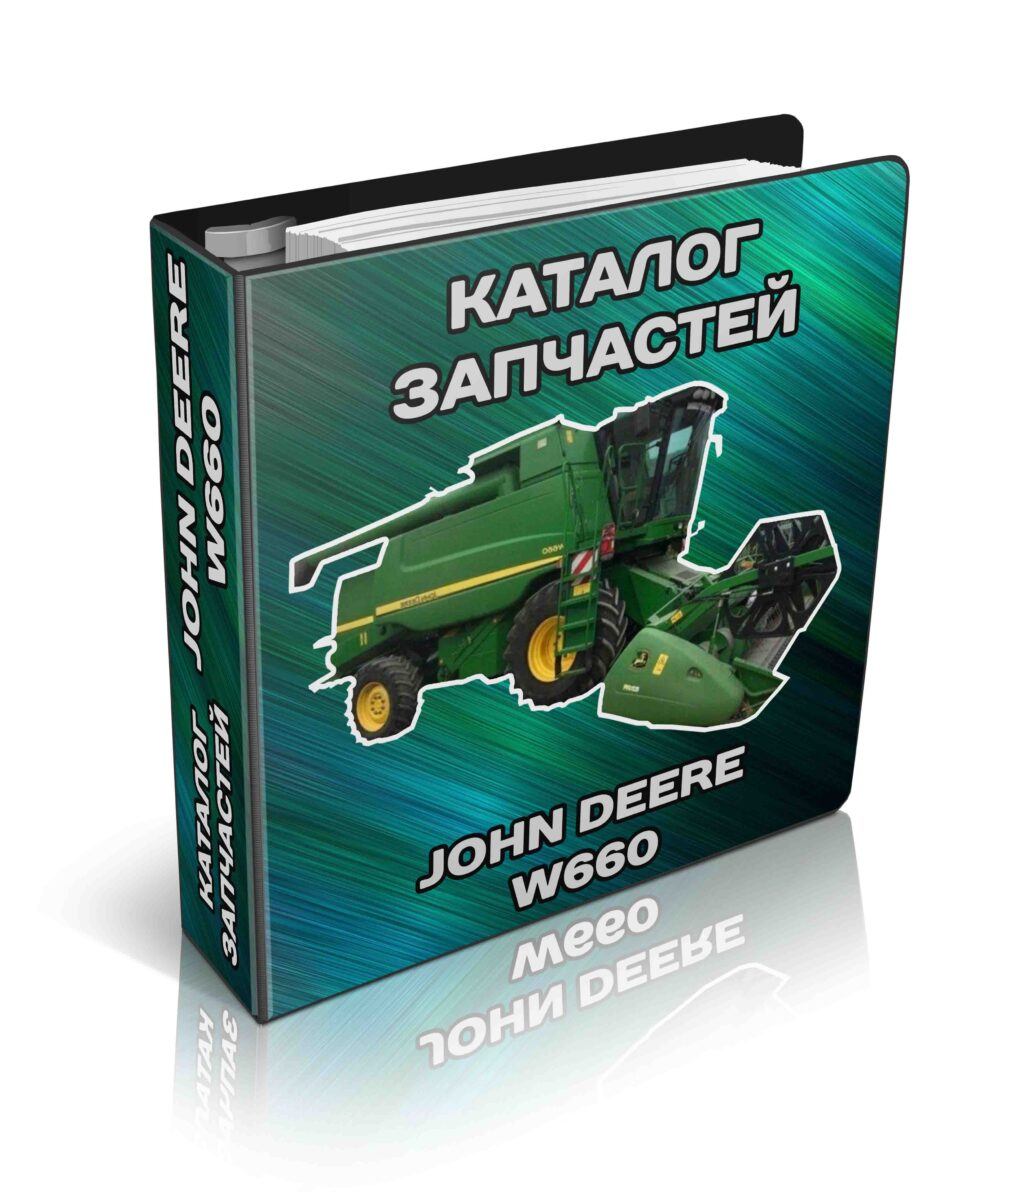 Каталог запчастей John Deere W660 купить онлайн на русском